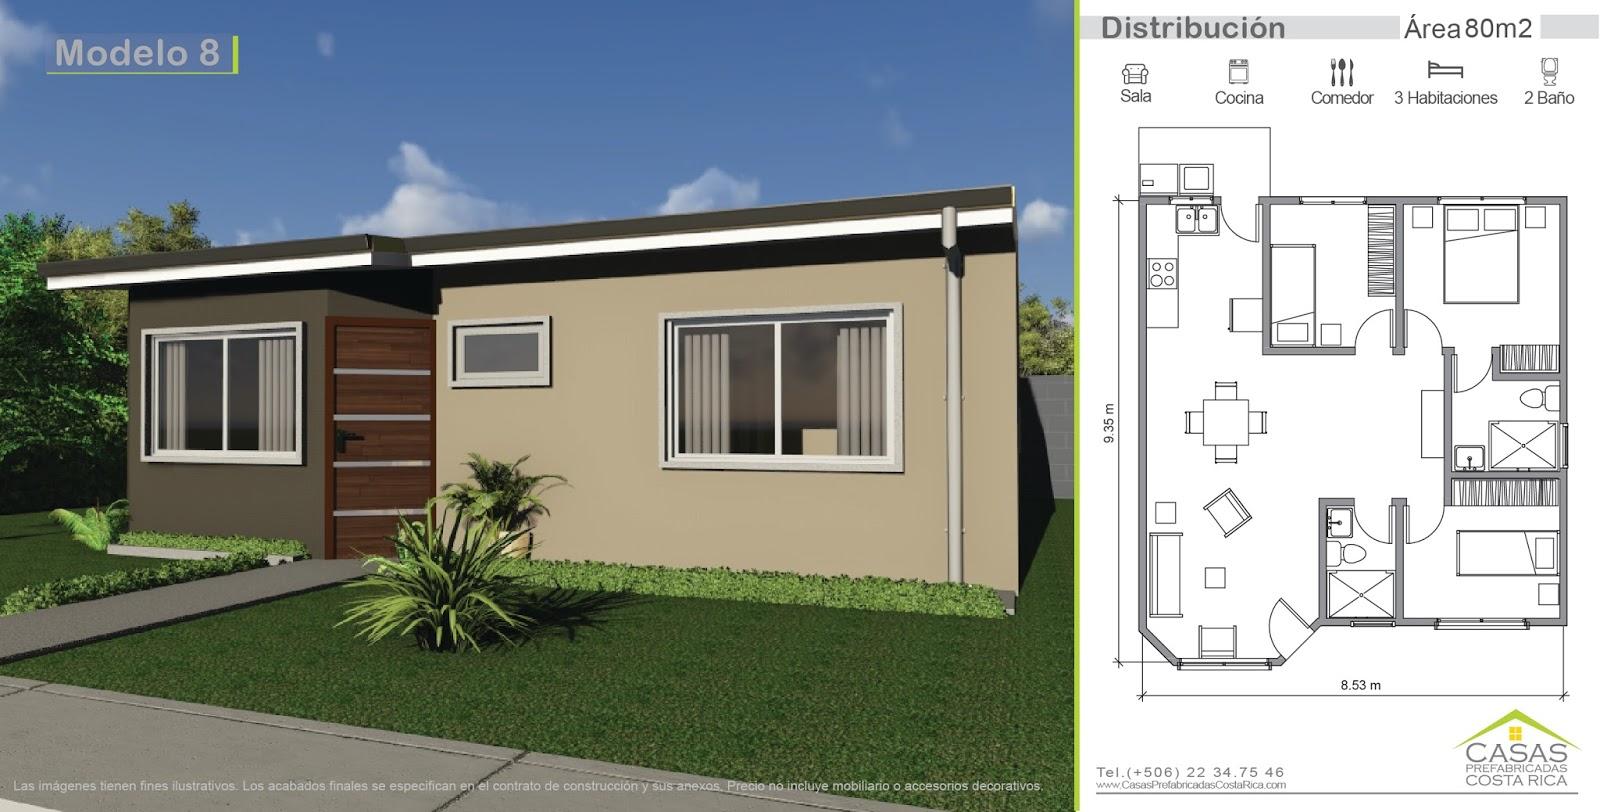 Casas prefabricadas costa rica 2015 for Diseno casas prefabricadas costa rica